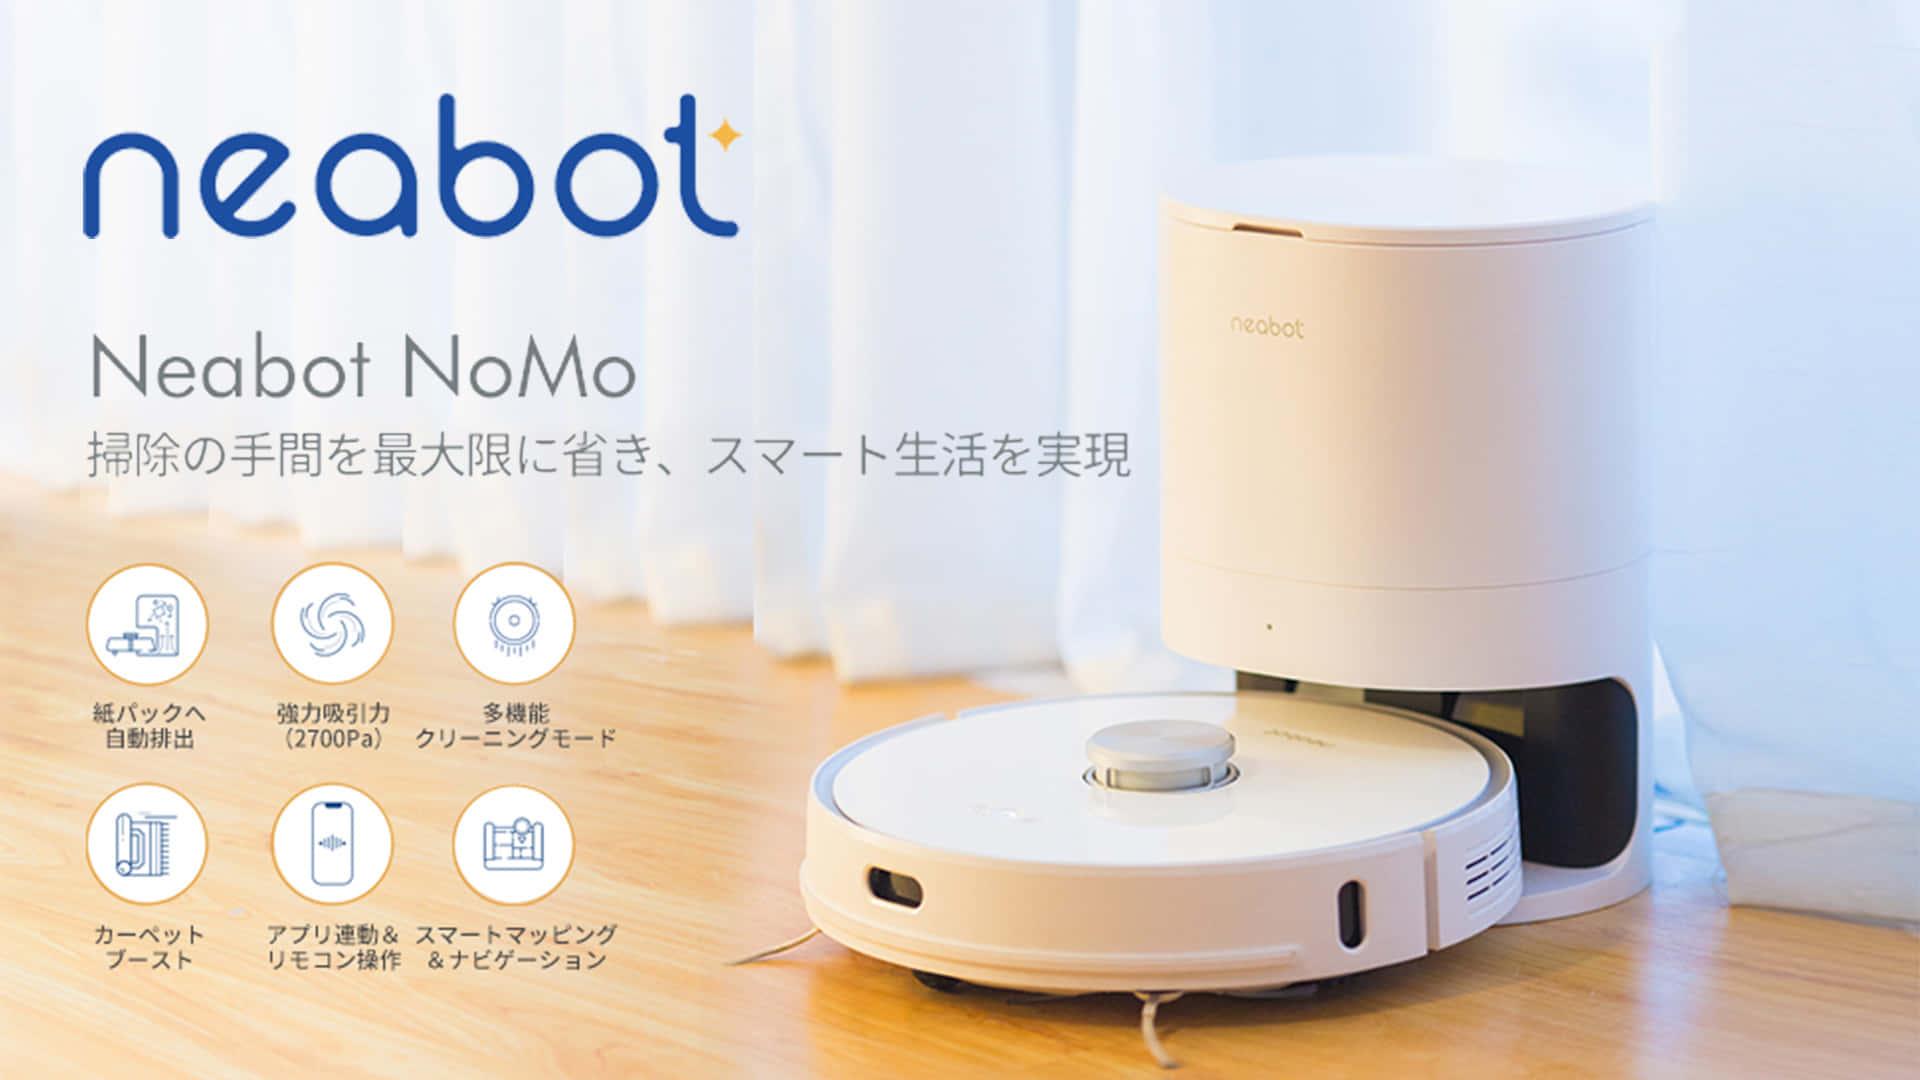 Neabot NoMo ロボット掃除機 レビュー、自動ゴミ回収&スマート管理機能を搭載